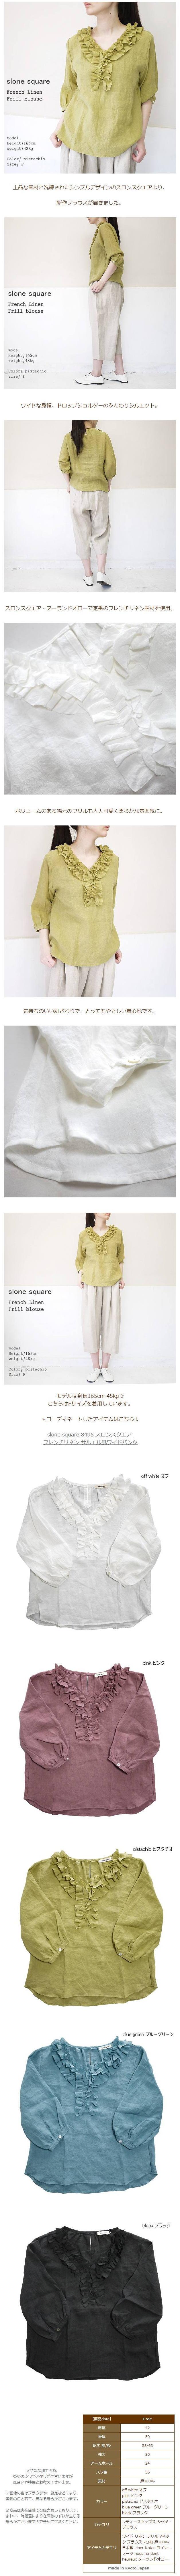 slone square スロンスクエア フレンチリネン フリルVネック 7分袖ブラウス 8089